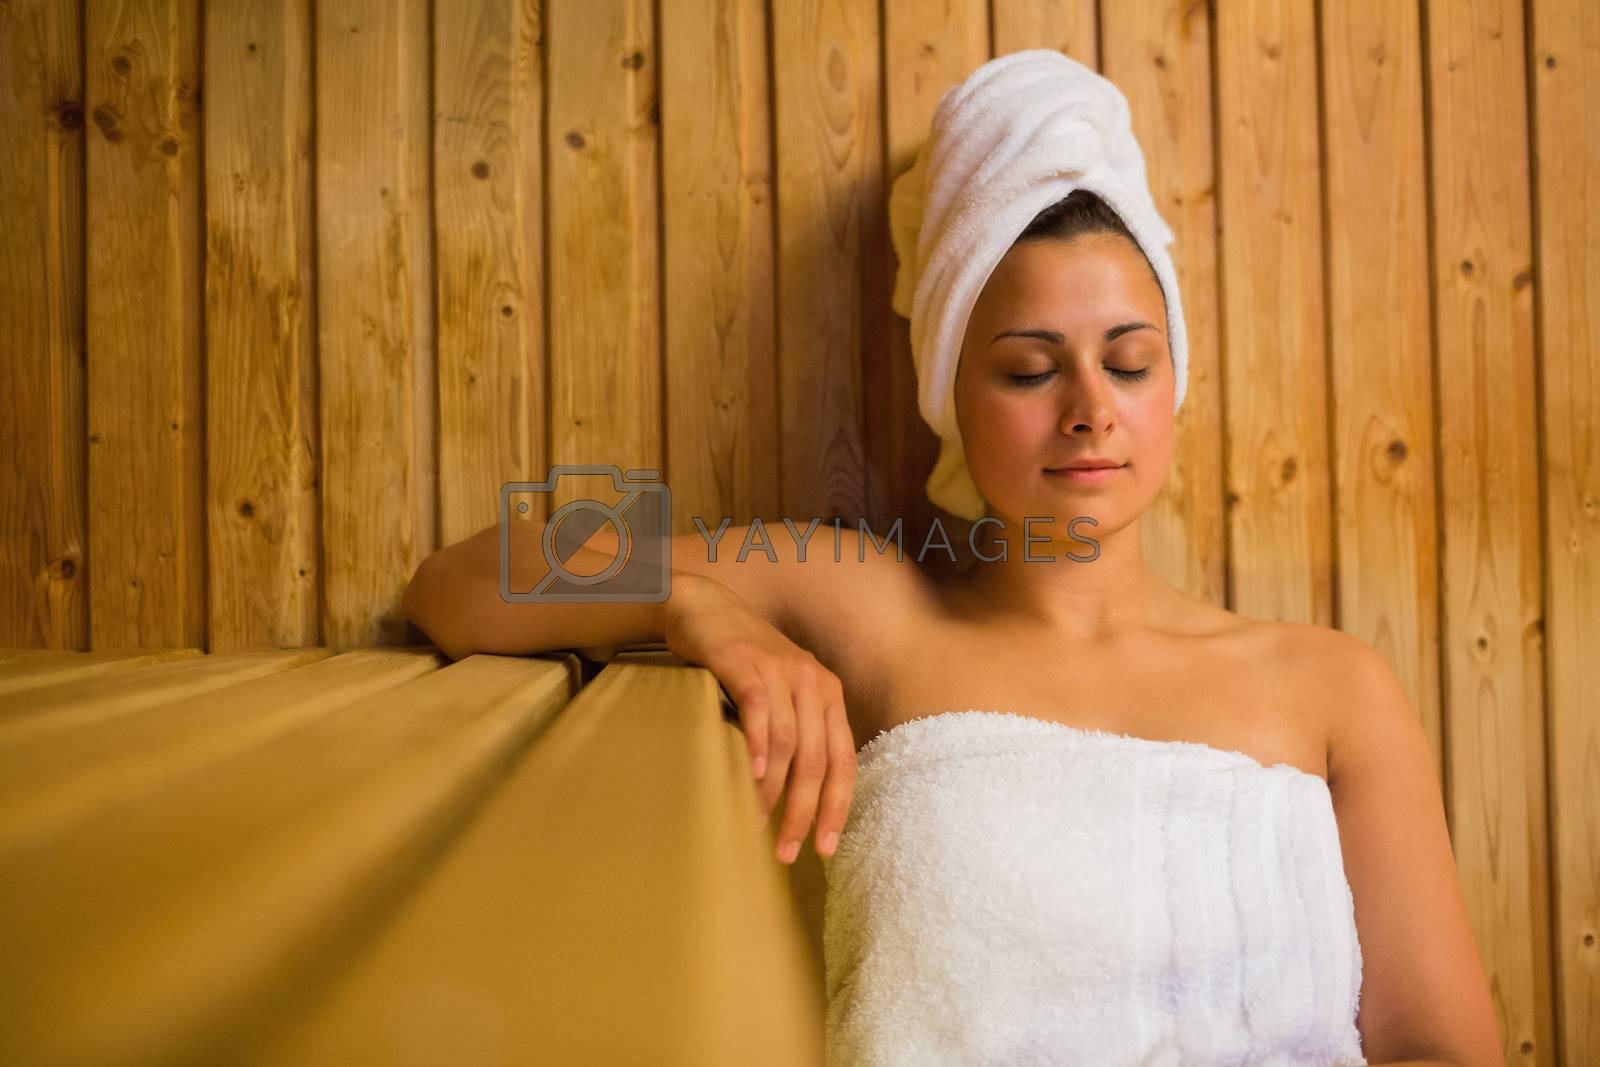 Calm woman relaxing in a sauna by Wavebreakmedia